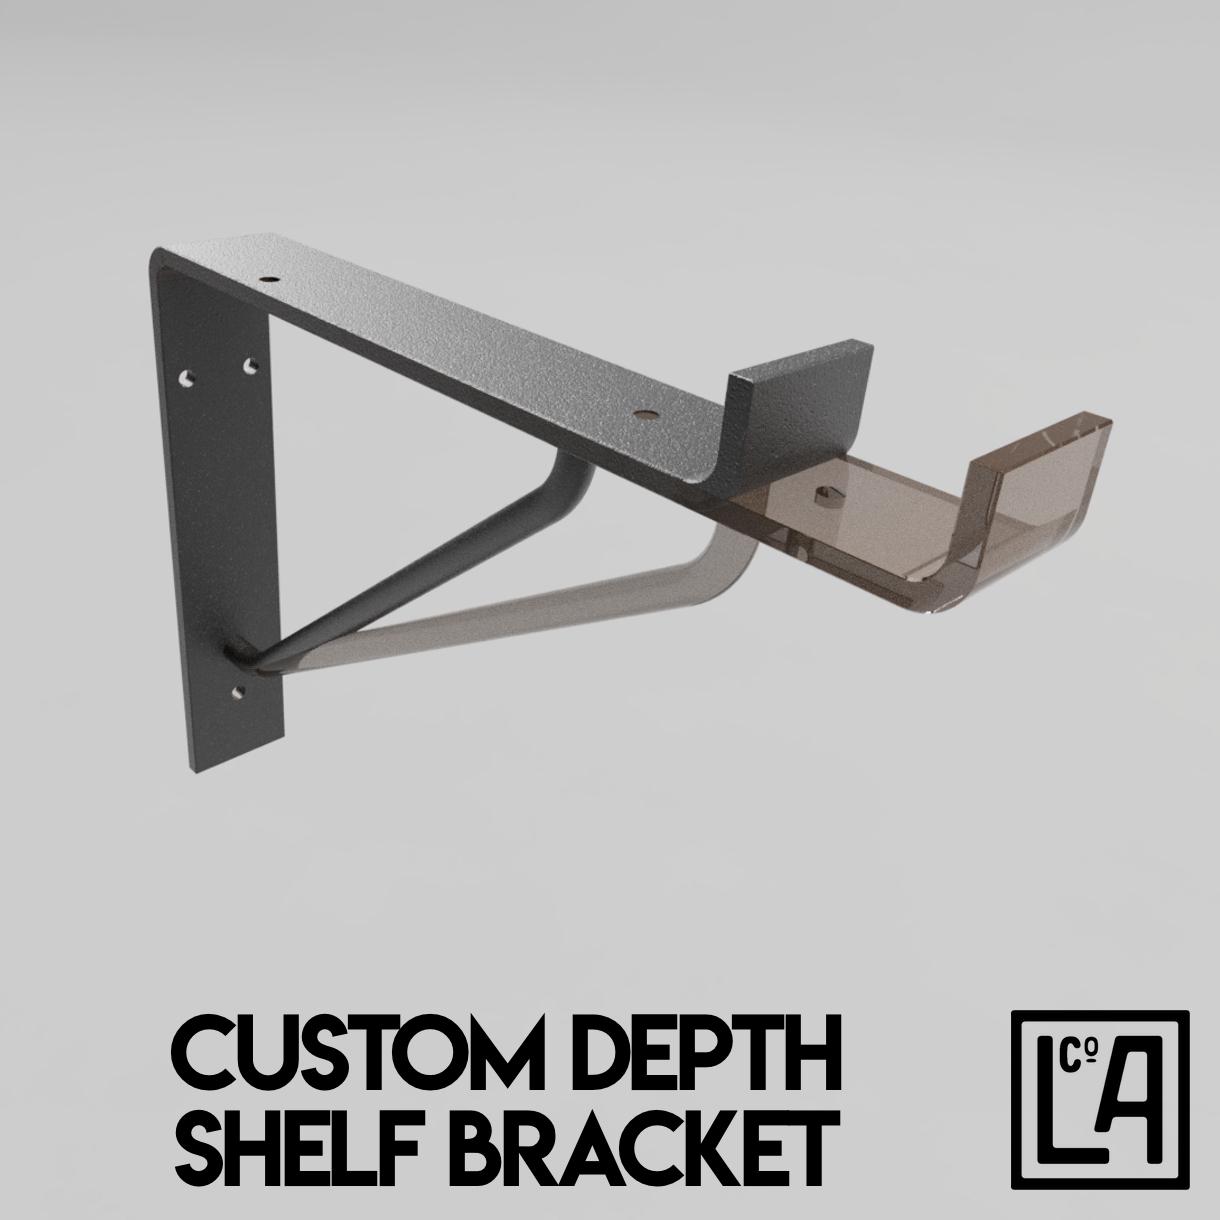 Customisable depth shelf bracket rendered drawing.